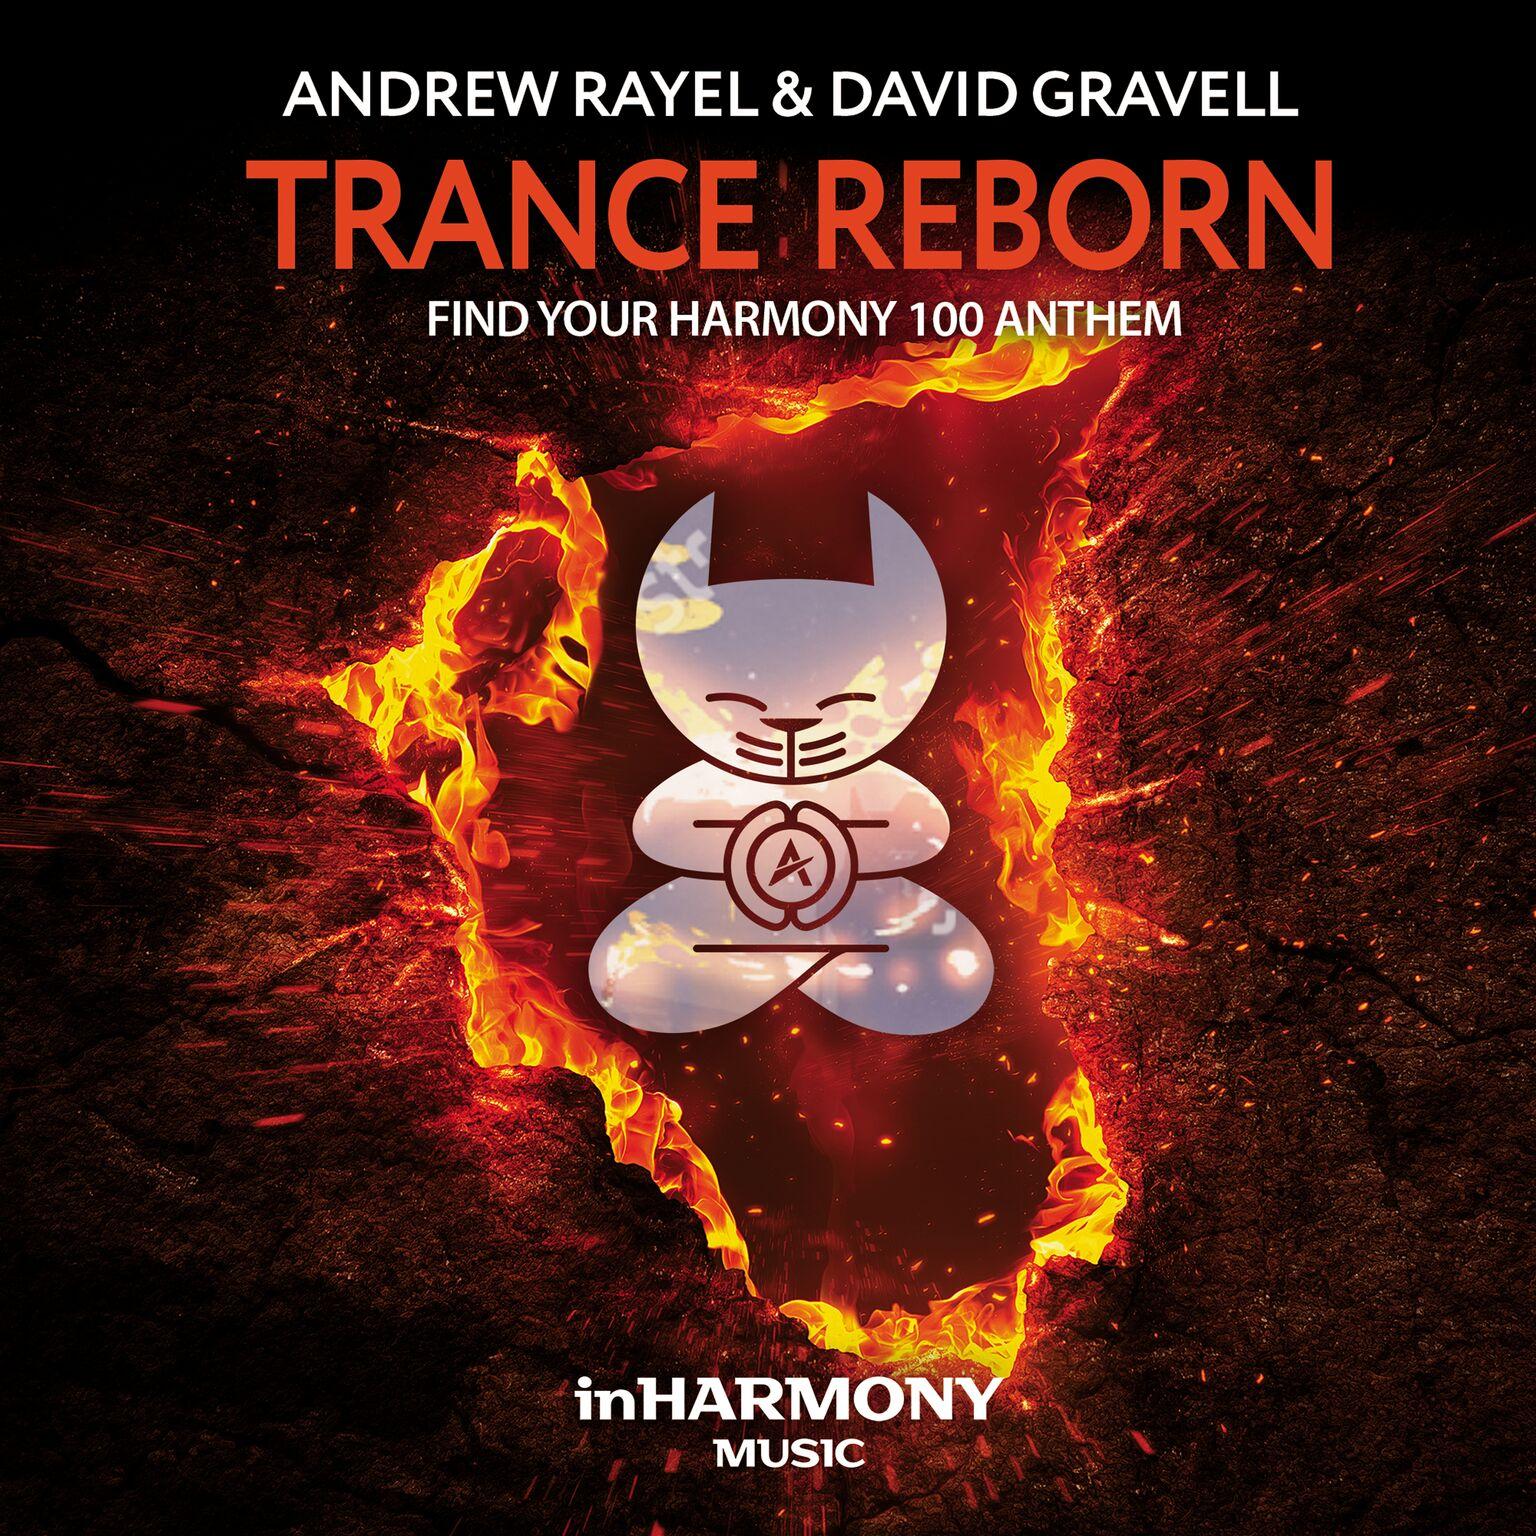 Andrew Rayel & David Gravell - Trance ReBorn (FYH100 Anthem)